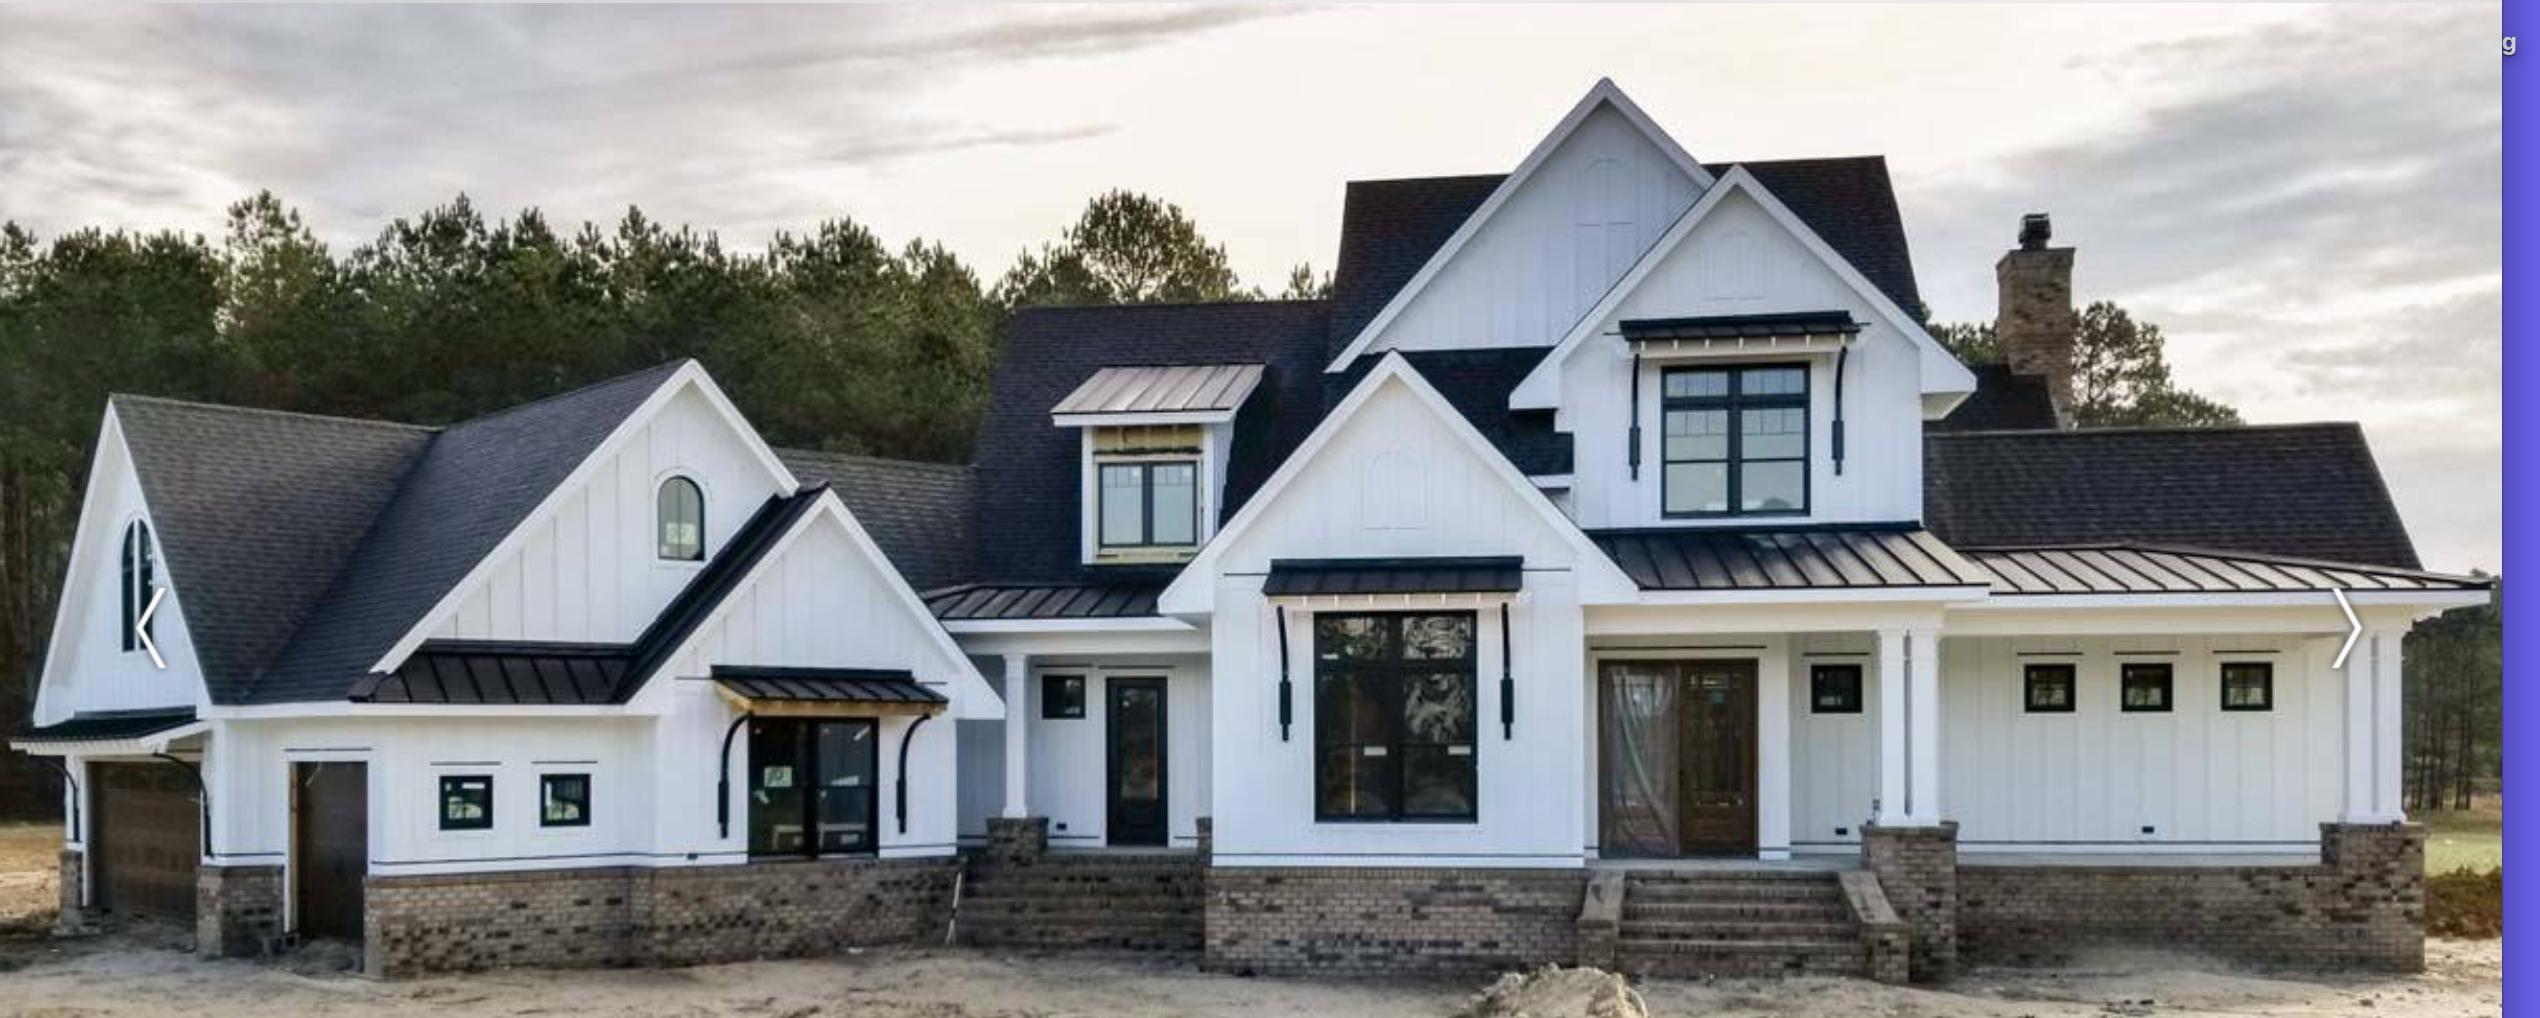 Plan 16853WG: Elegant 3-Bed Farmhouse with Great O